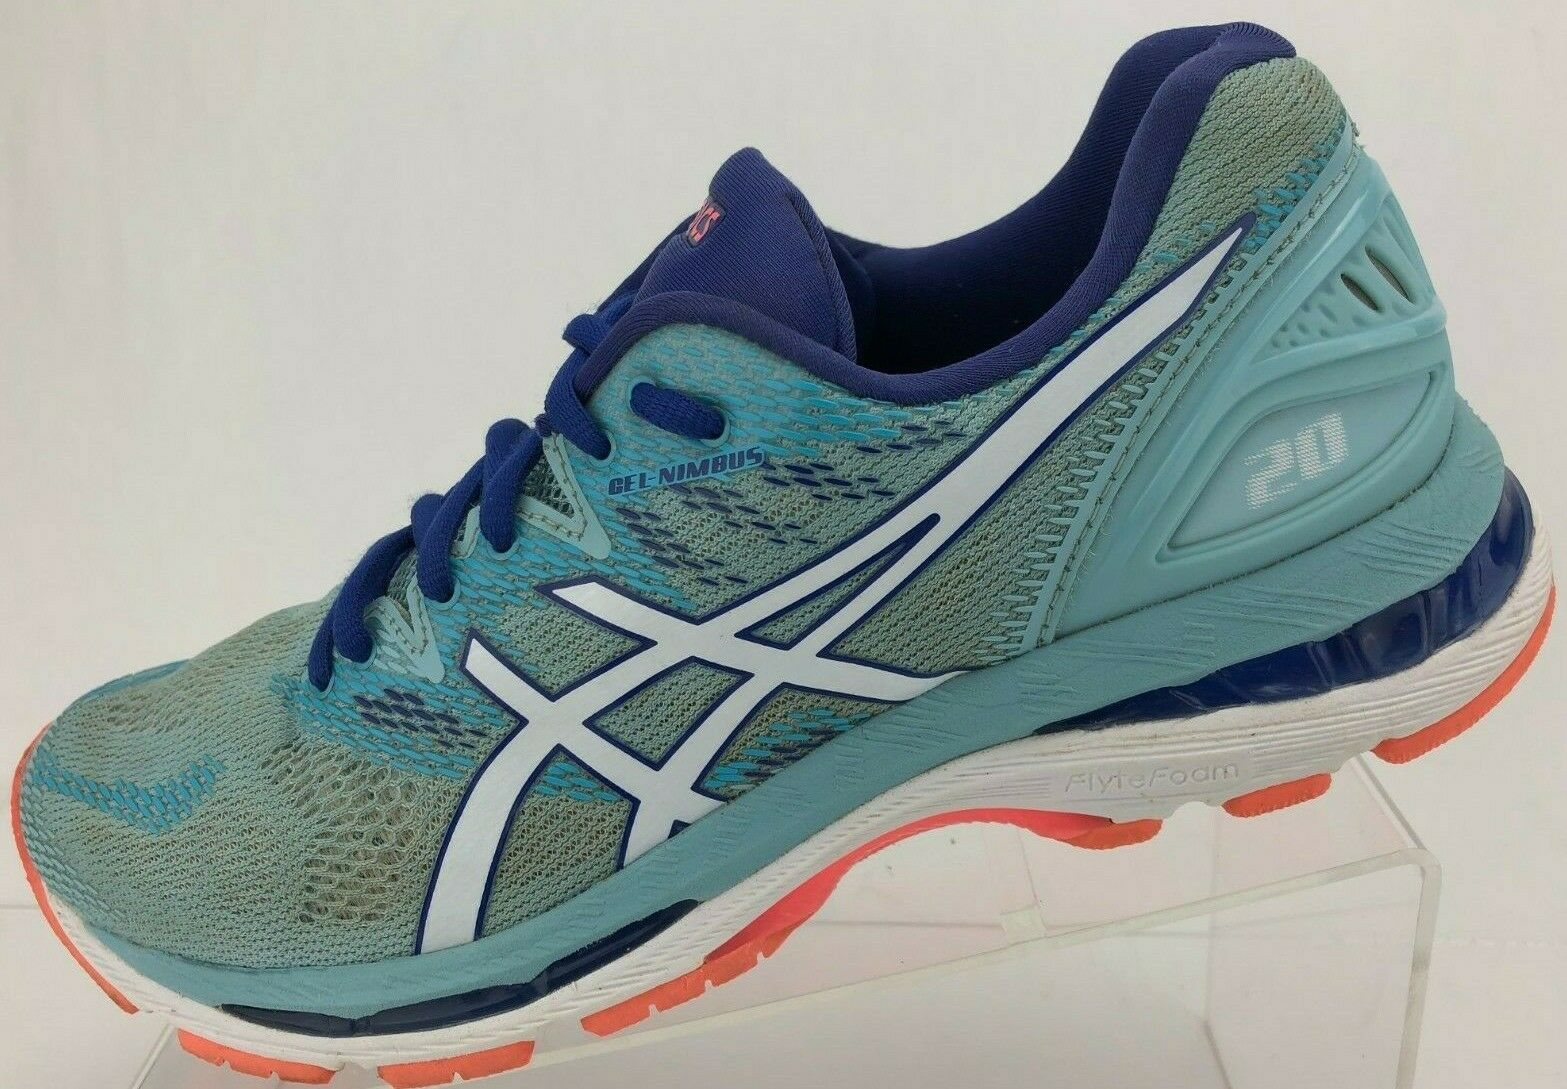 Asics Gel Nimbus 20 Running schuhe Blau Multi Farbe Training Turnschuhe damen 9.5